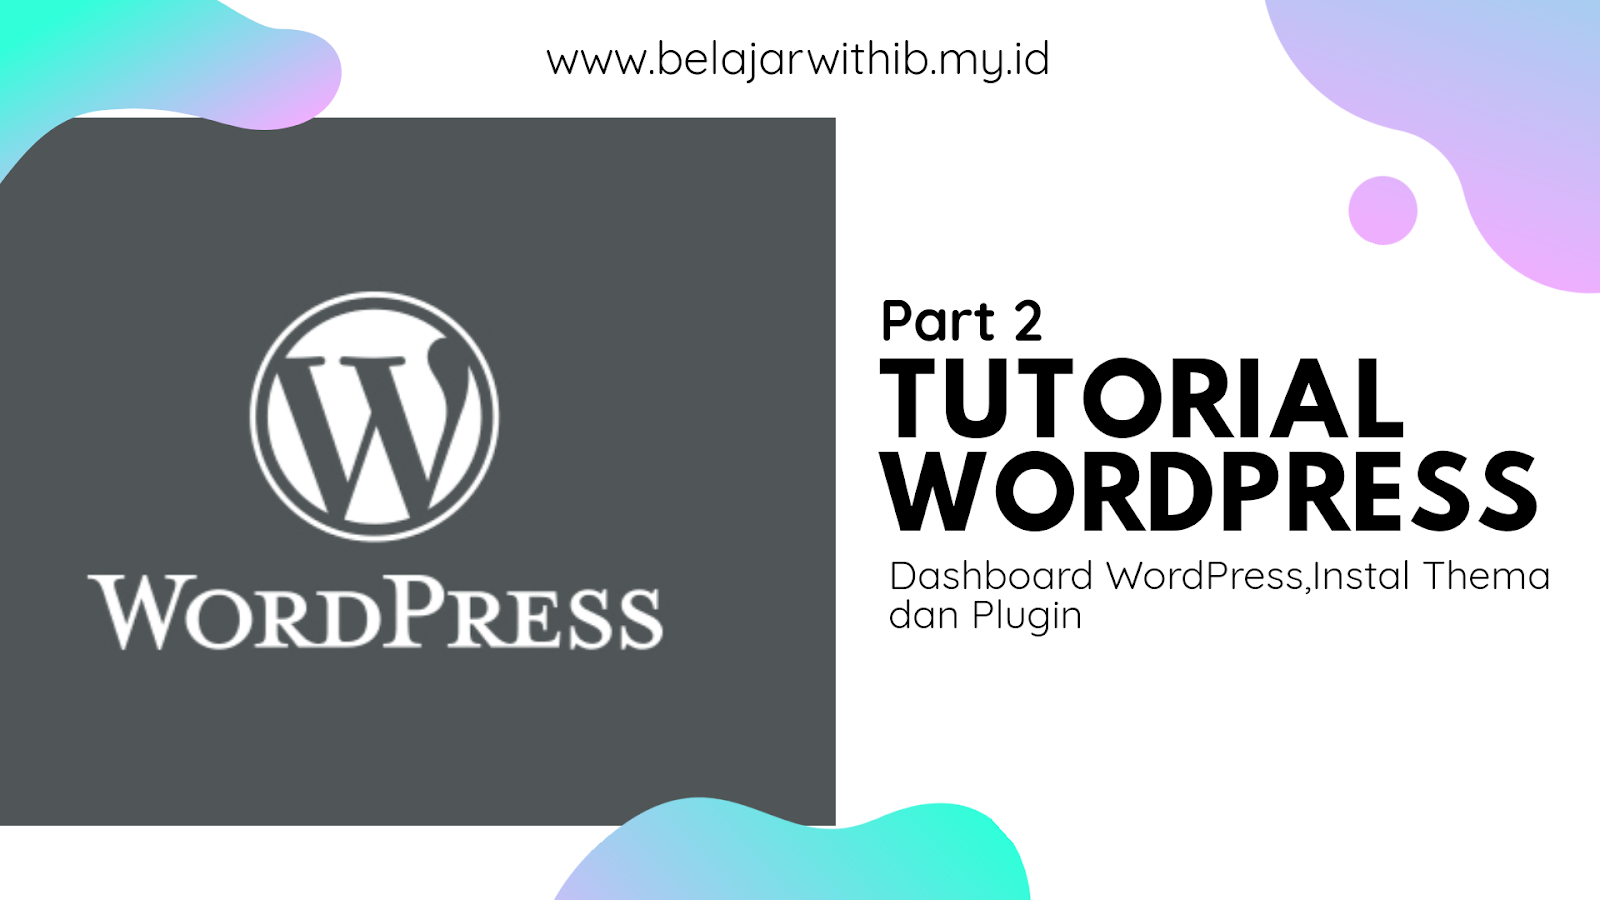 Tutorial Wordpress Part 2 :Dashboard Wordpress,Instal Thema dan Plugin